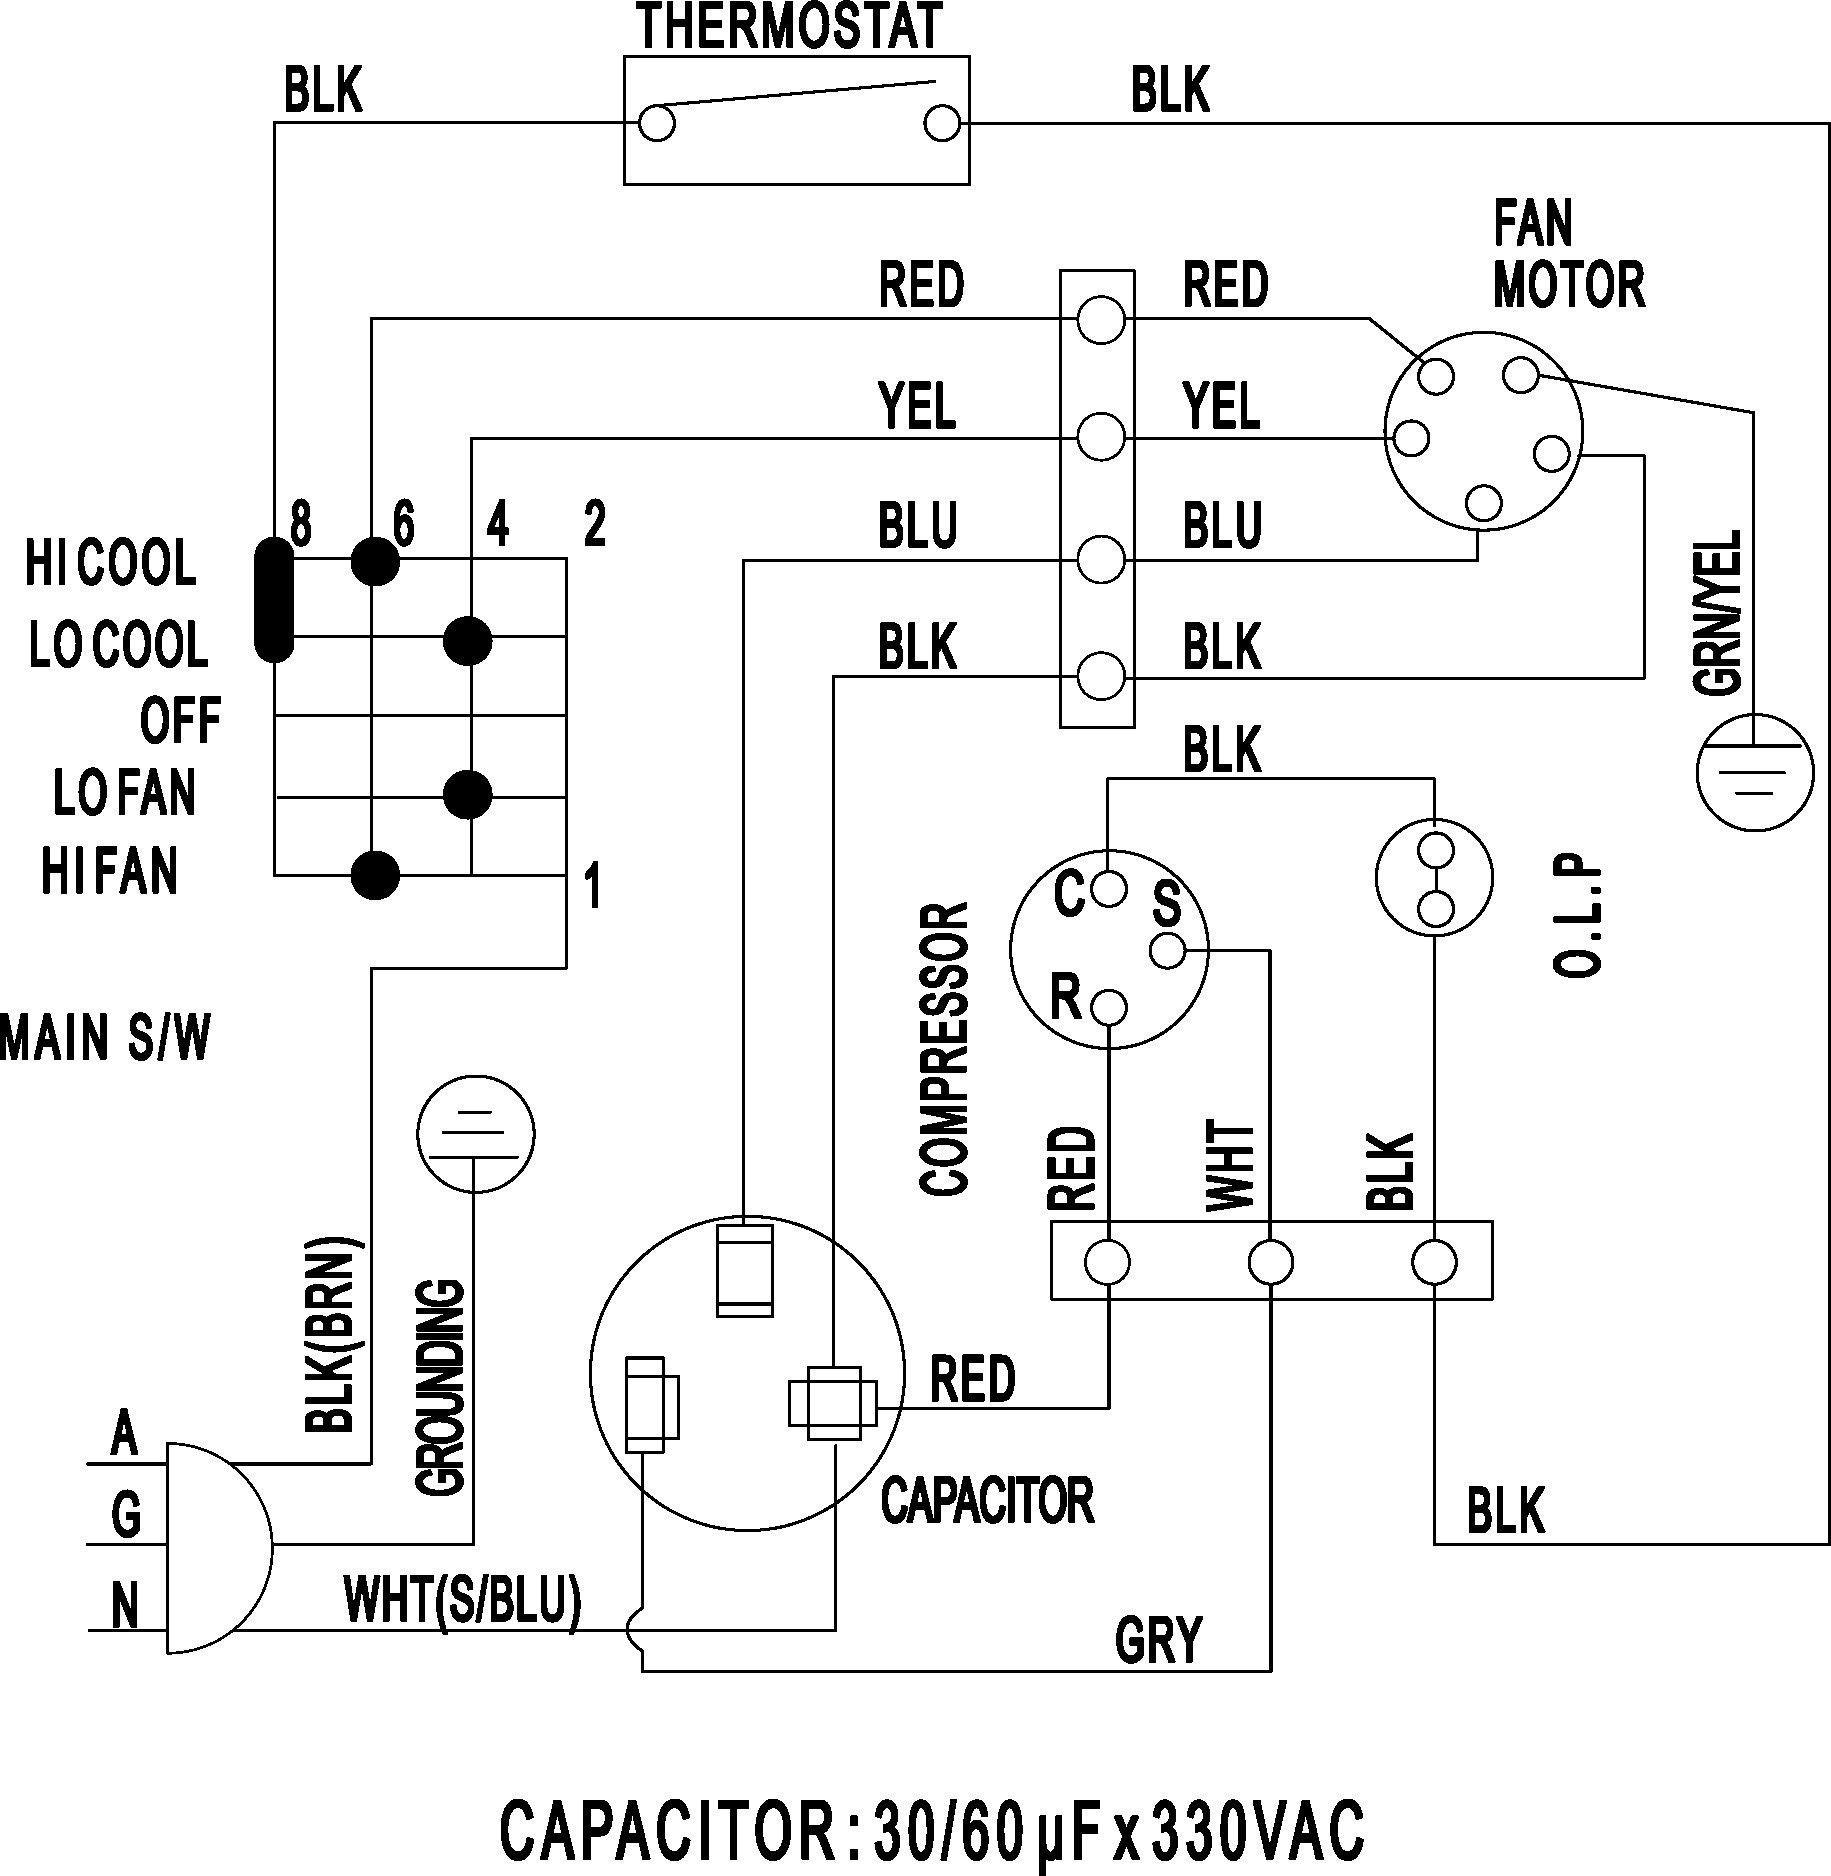 Split Ac Wiring Diagram Pdf   2019 Ebook Library - Ac Wiring Diagram Pdf